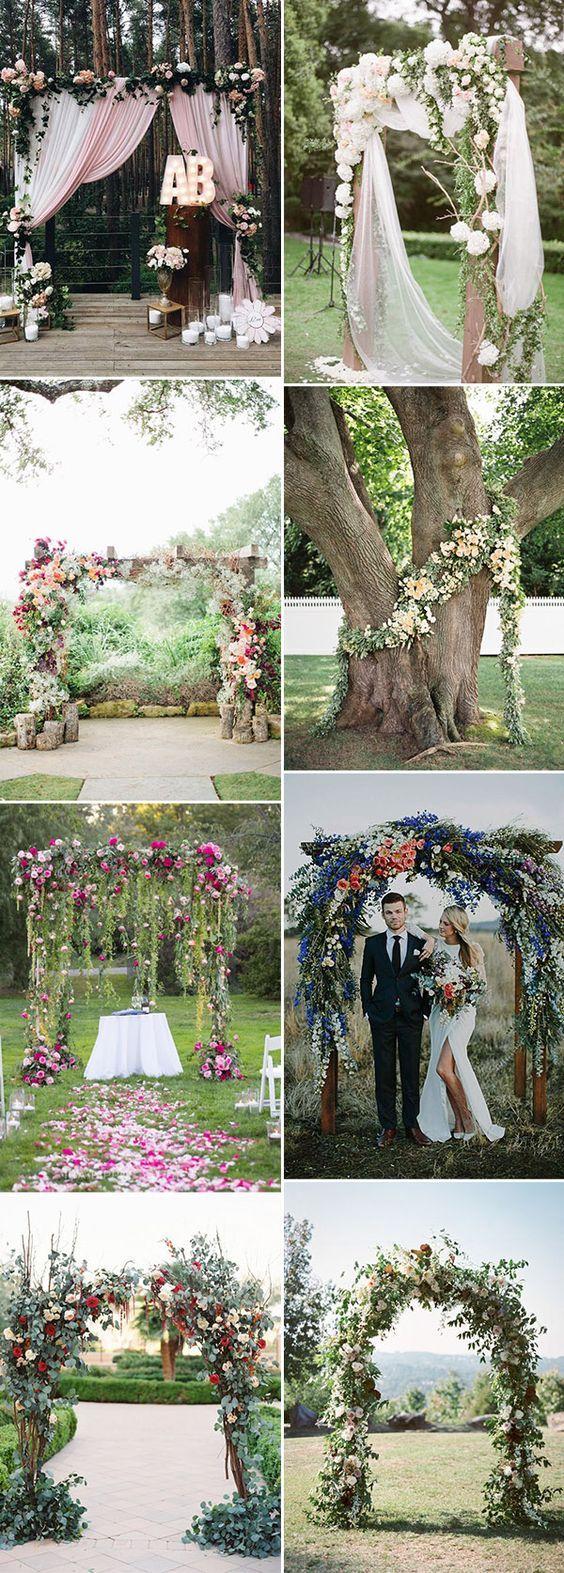 Boda civil en jardin decoracion de fiestas cumplea os - Decoracion jardin boda civil ...